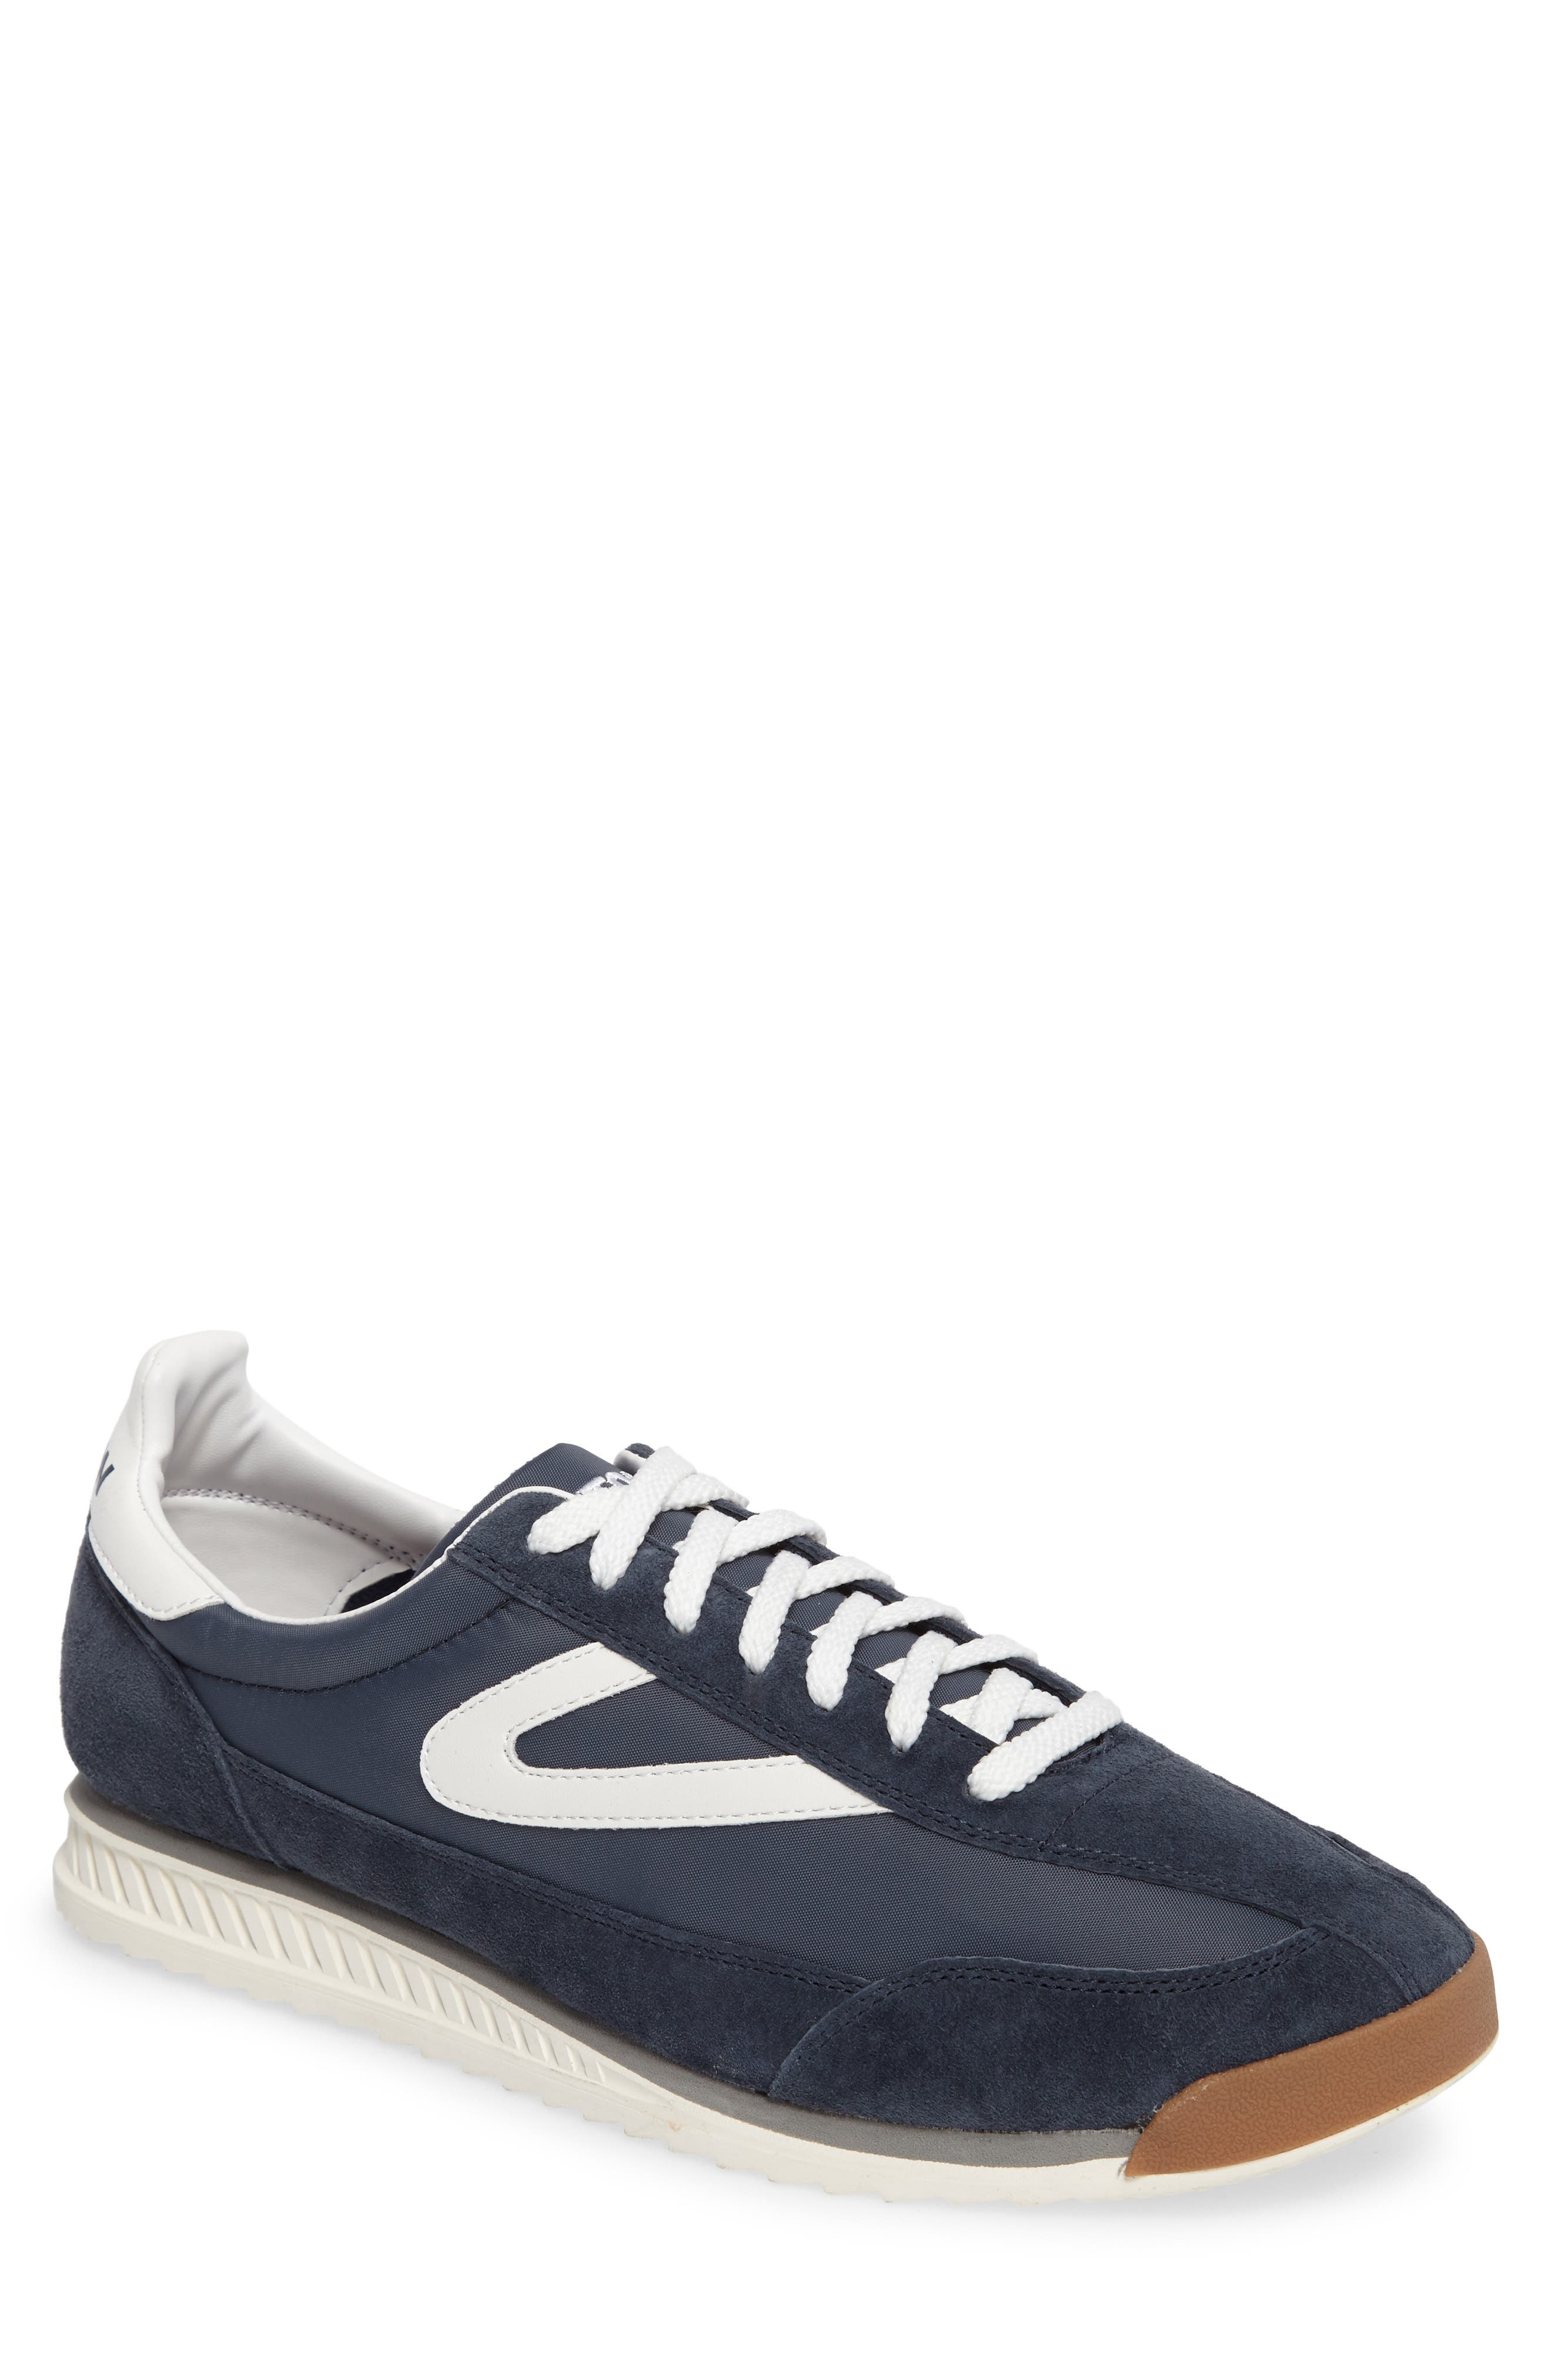 Rawlins 3 Sneaker,                             Main thumbnail 1, color,                             Blue/ Blue/ White